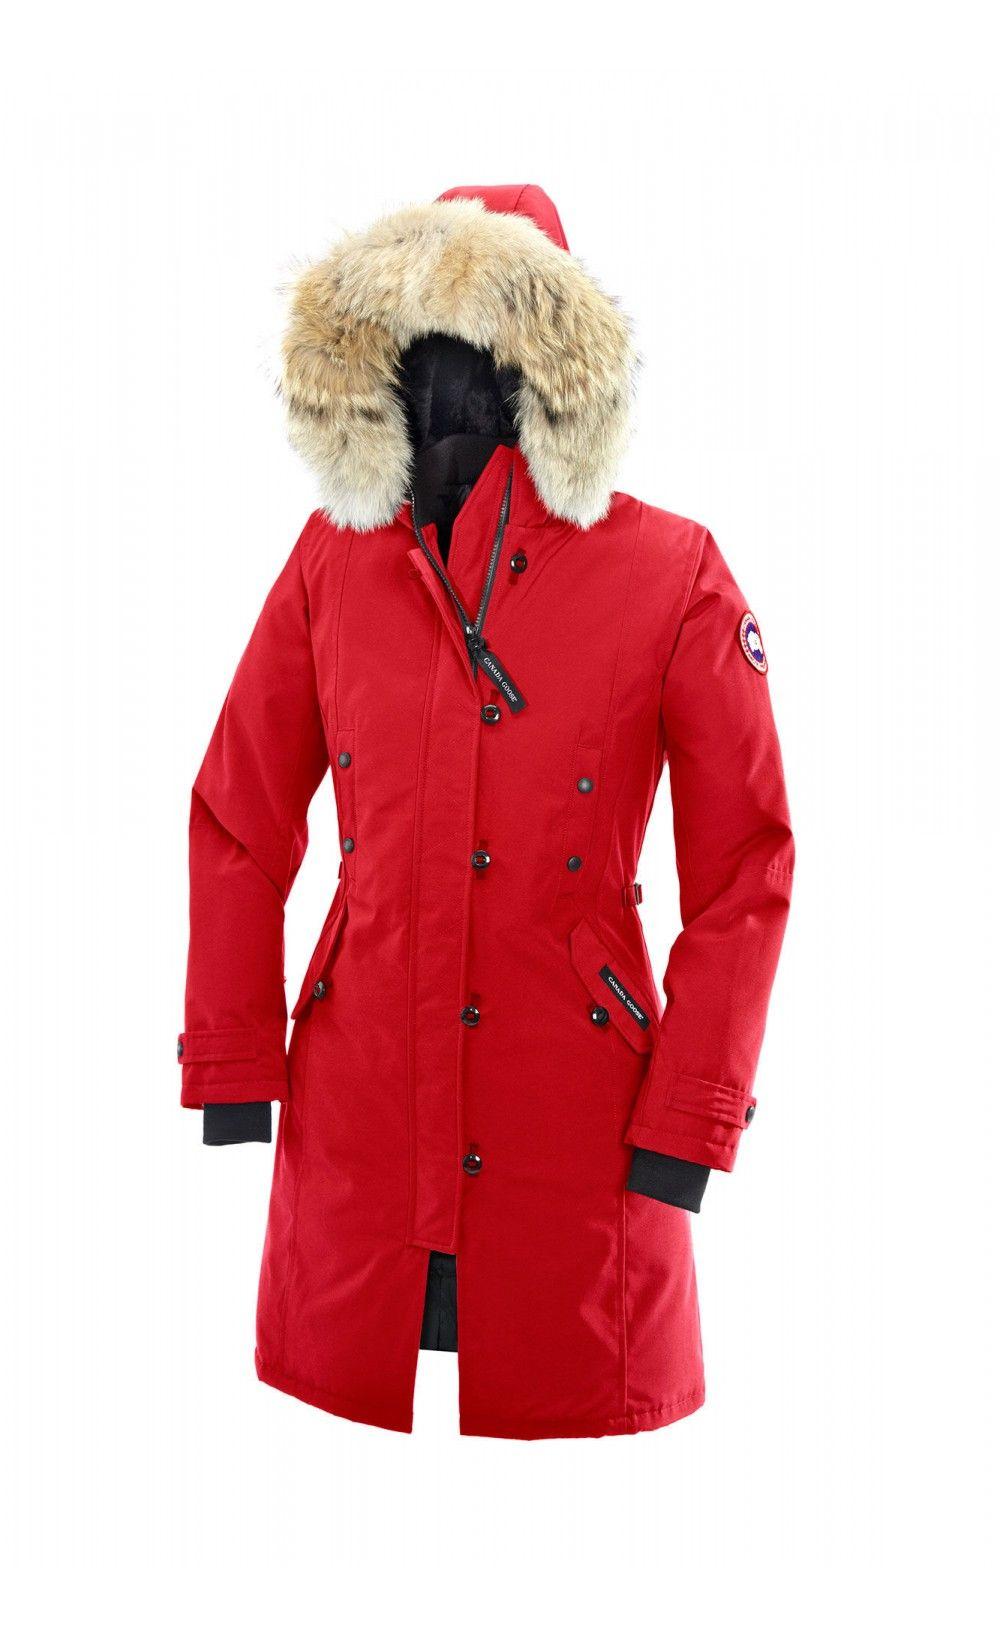 Canada Goose Kensington Parka Red Women Canada Goose Kensington Parka Fashion Fashion Lookbook